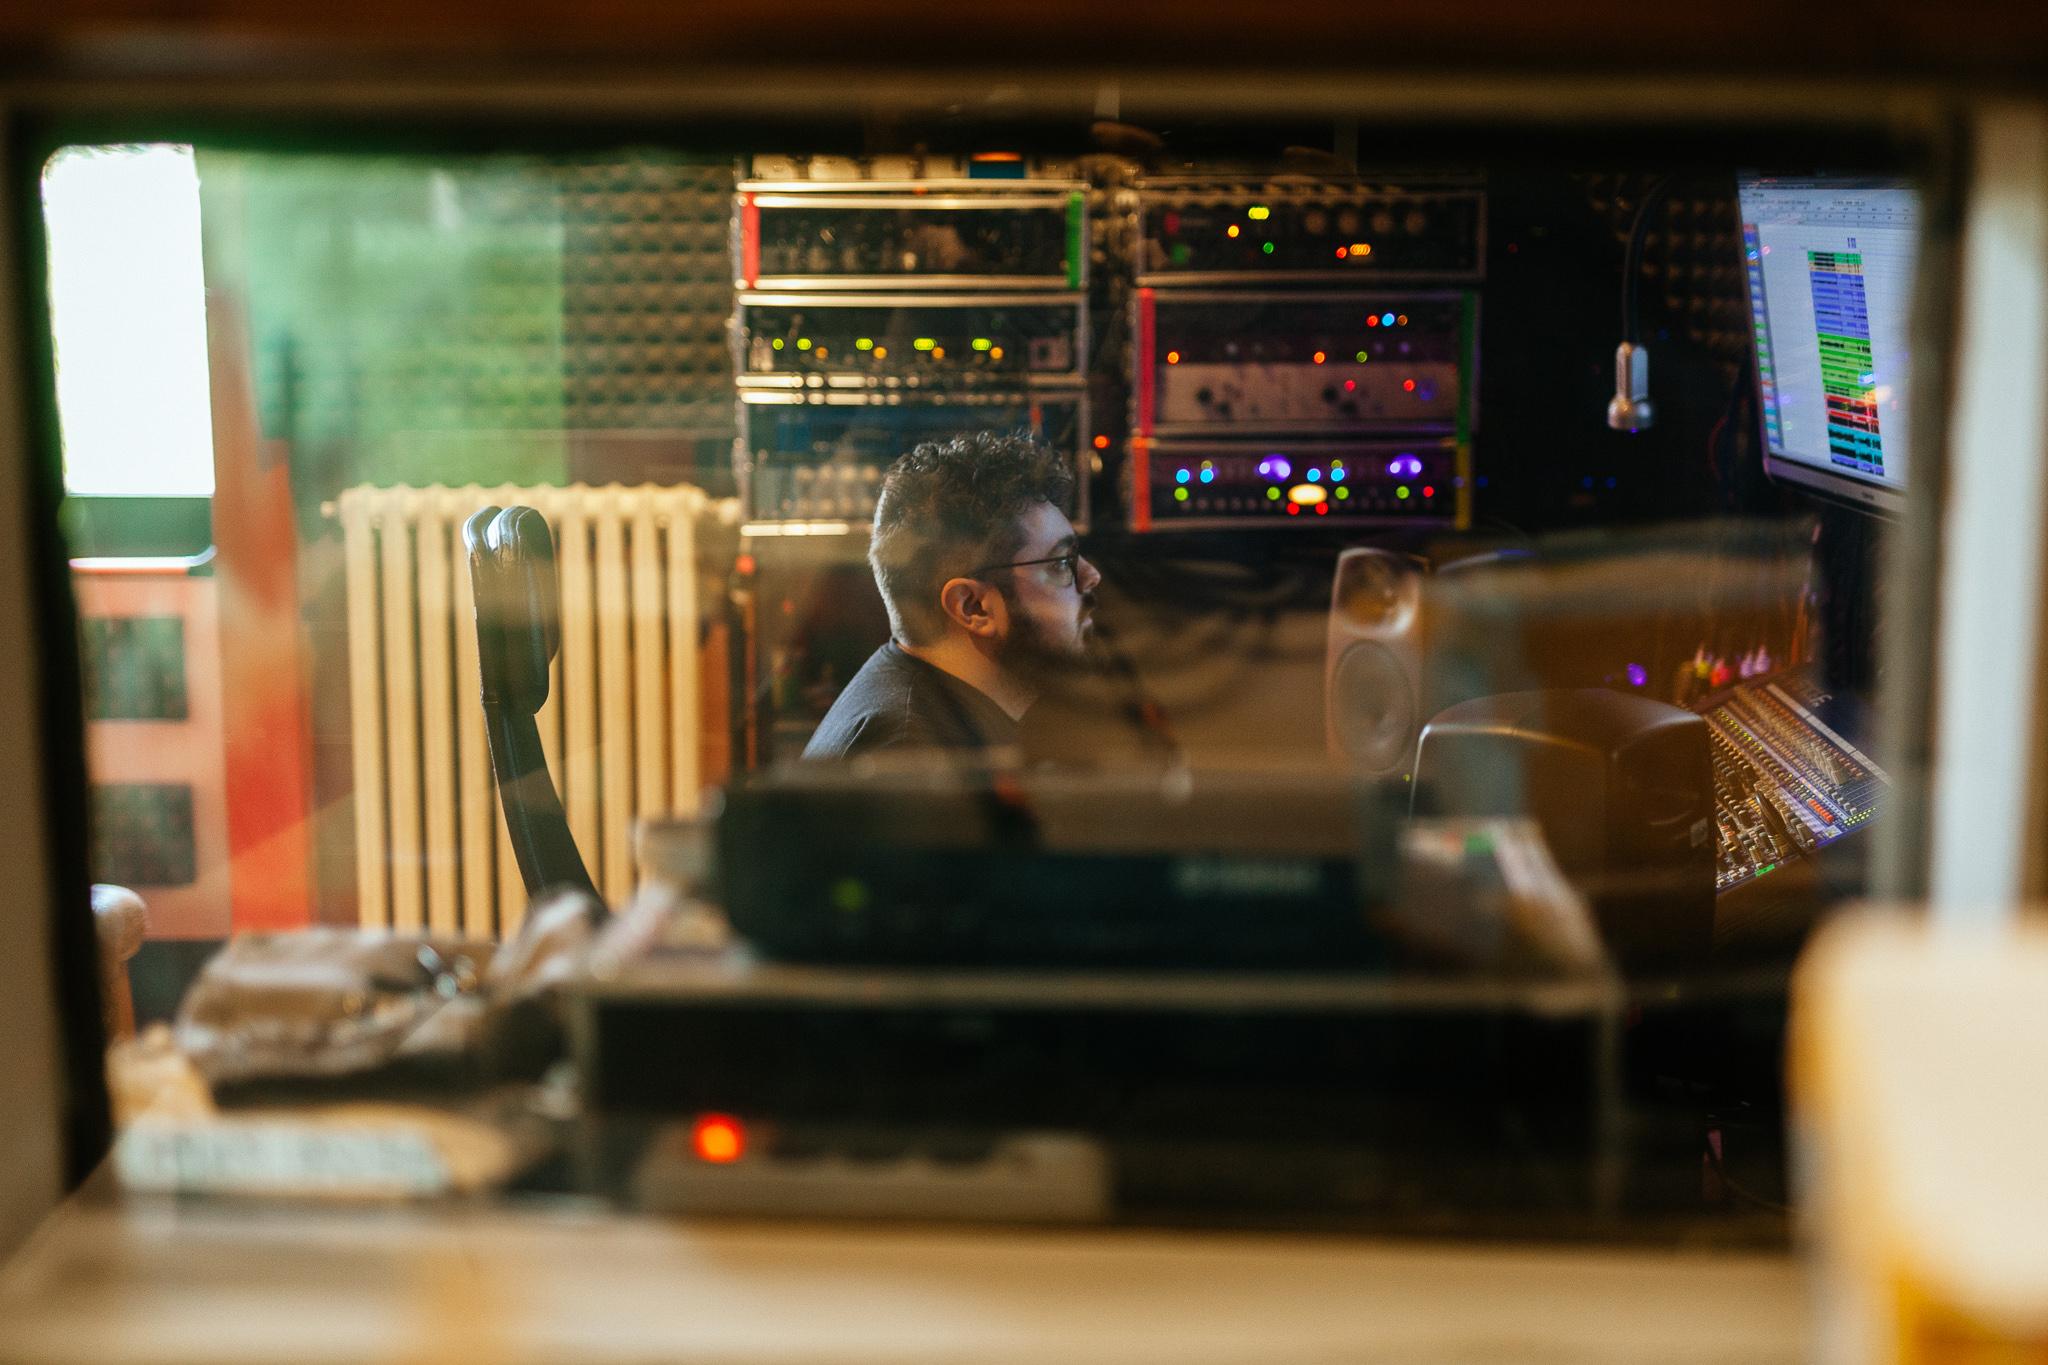 foto studio di registrazione